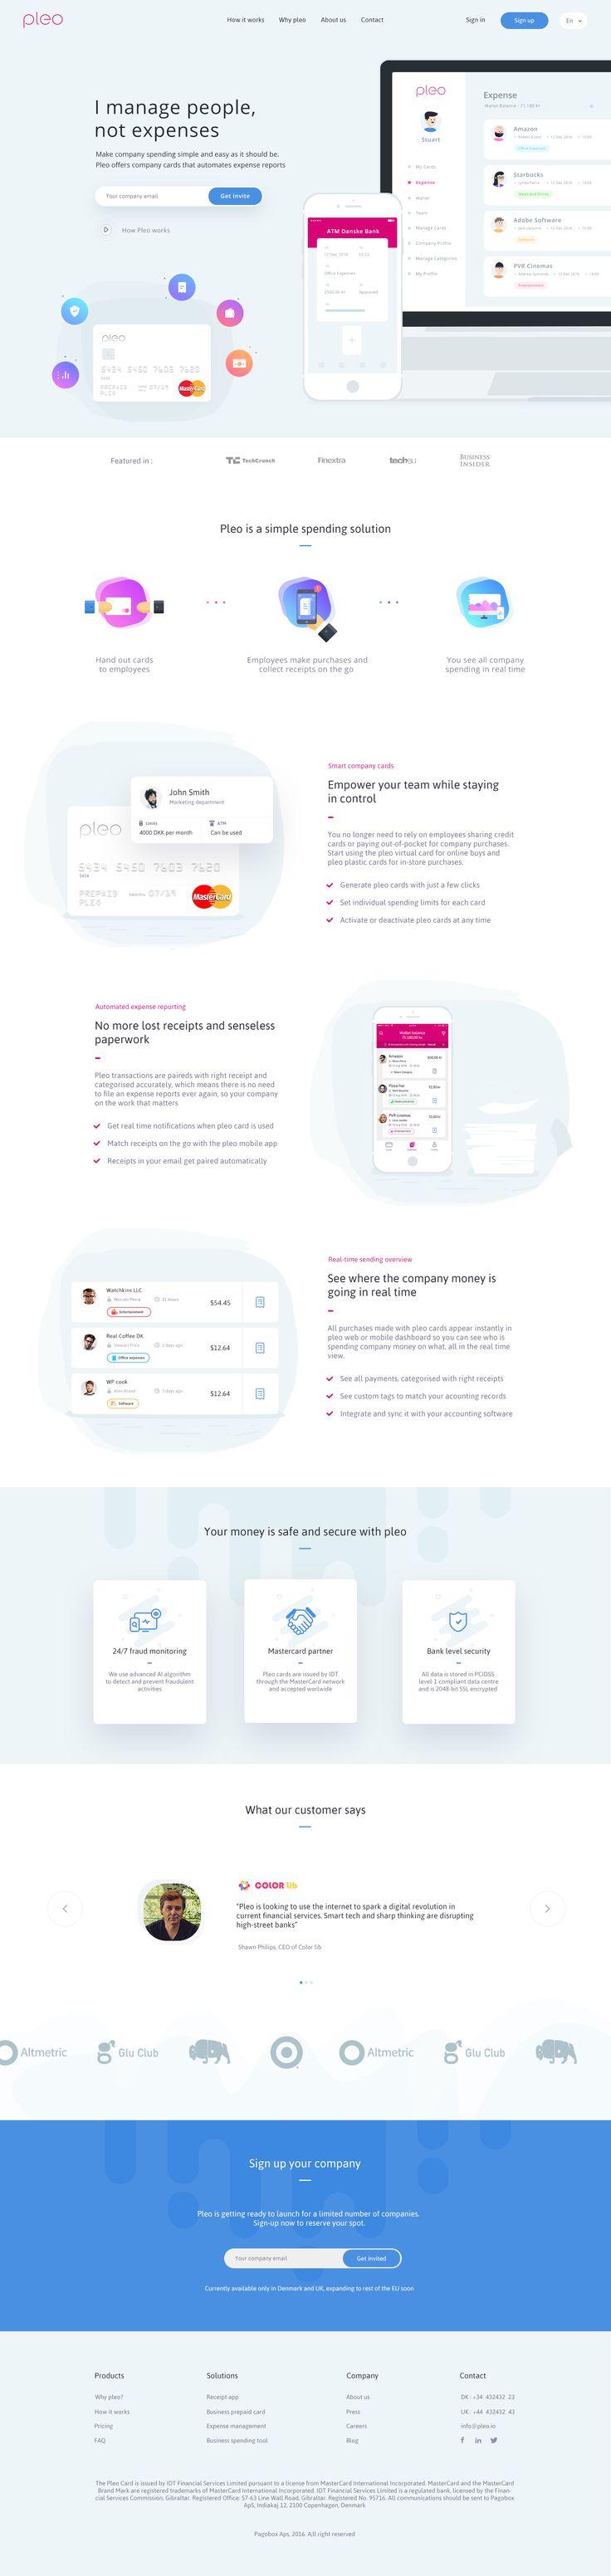 Pleo Website #webdesign #website #uidesign